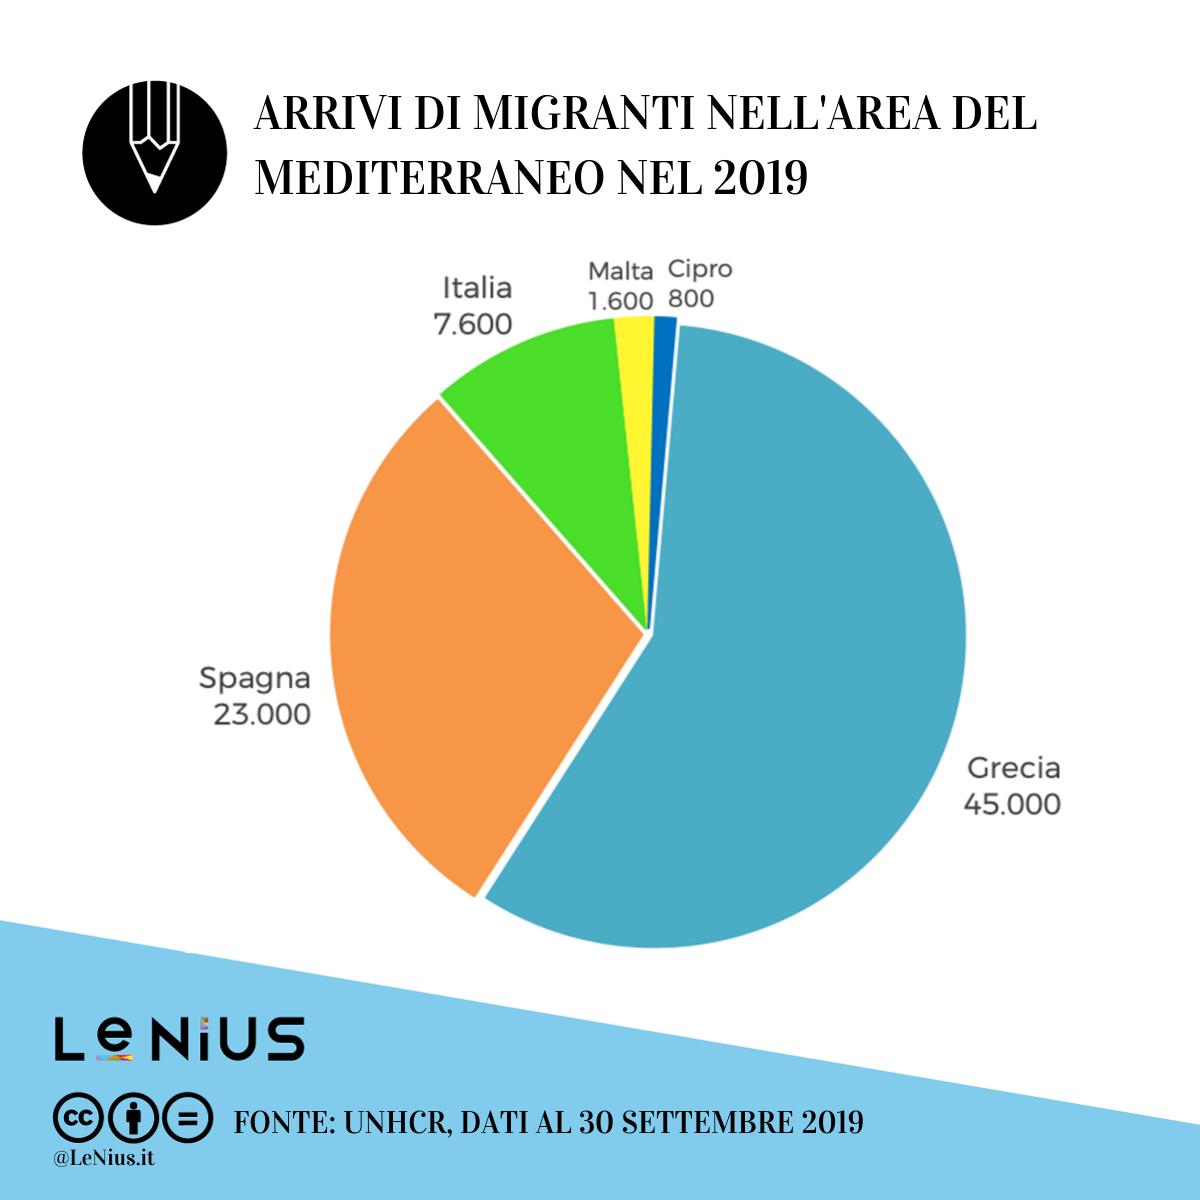 migranti in europa 2019